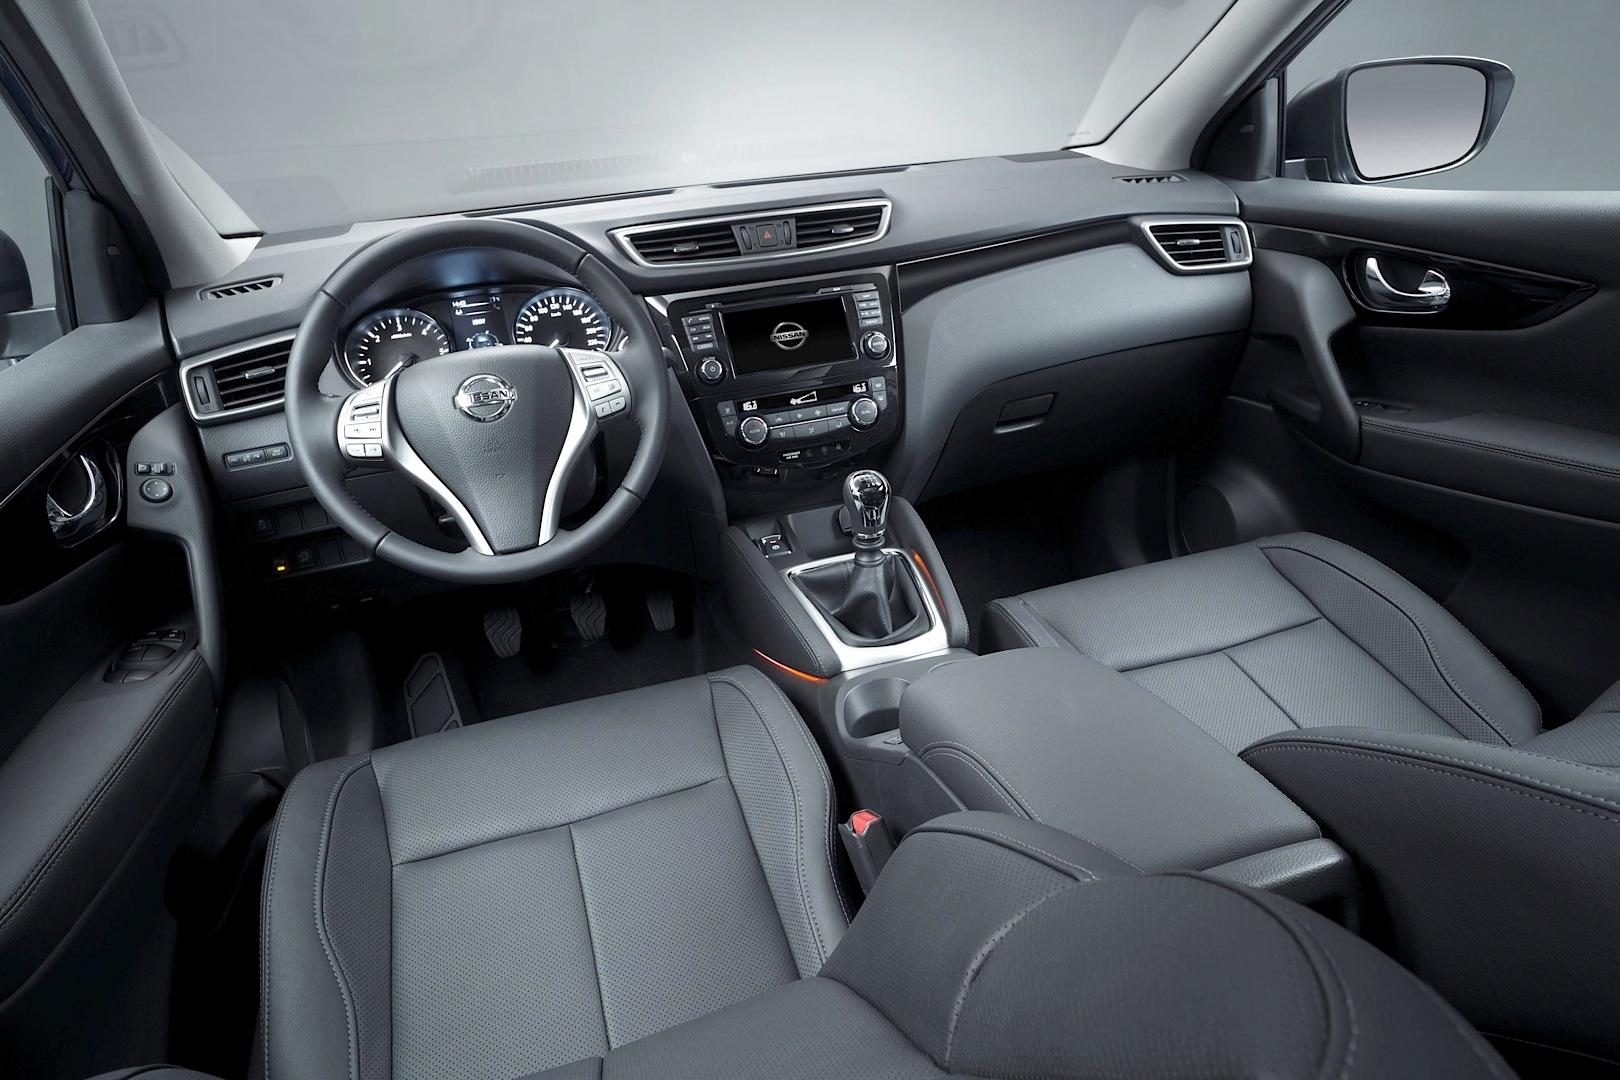 2014-Nissan-Qashqai-ic-mekan-1.jpg